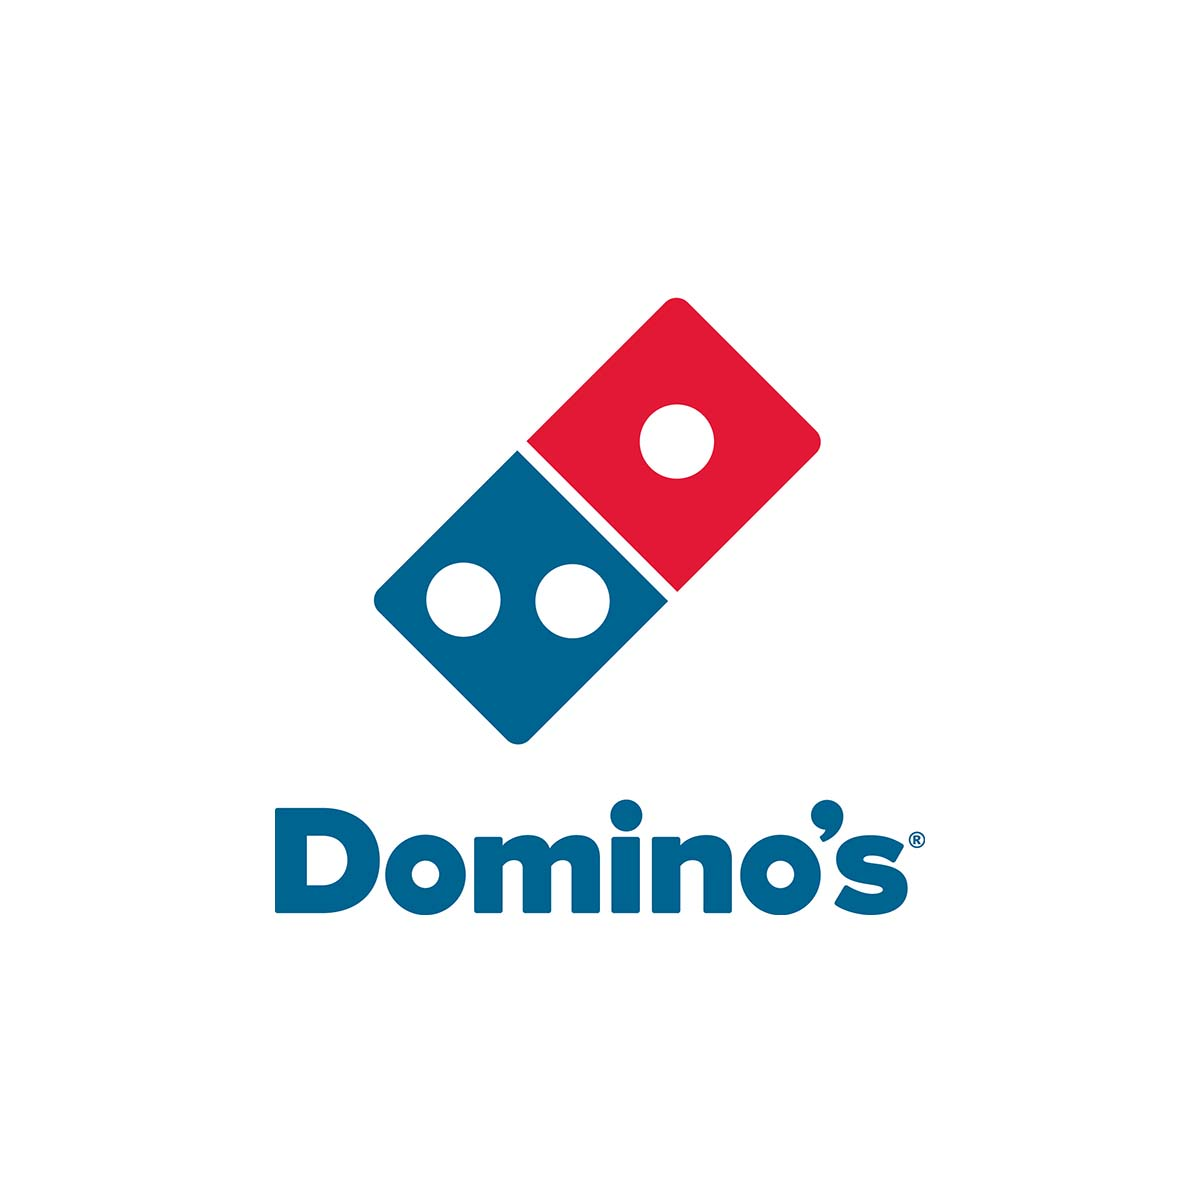 Domino's Pizza - 300 University St, Martin, TN 38237(731) 587-3167